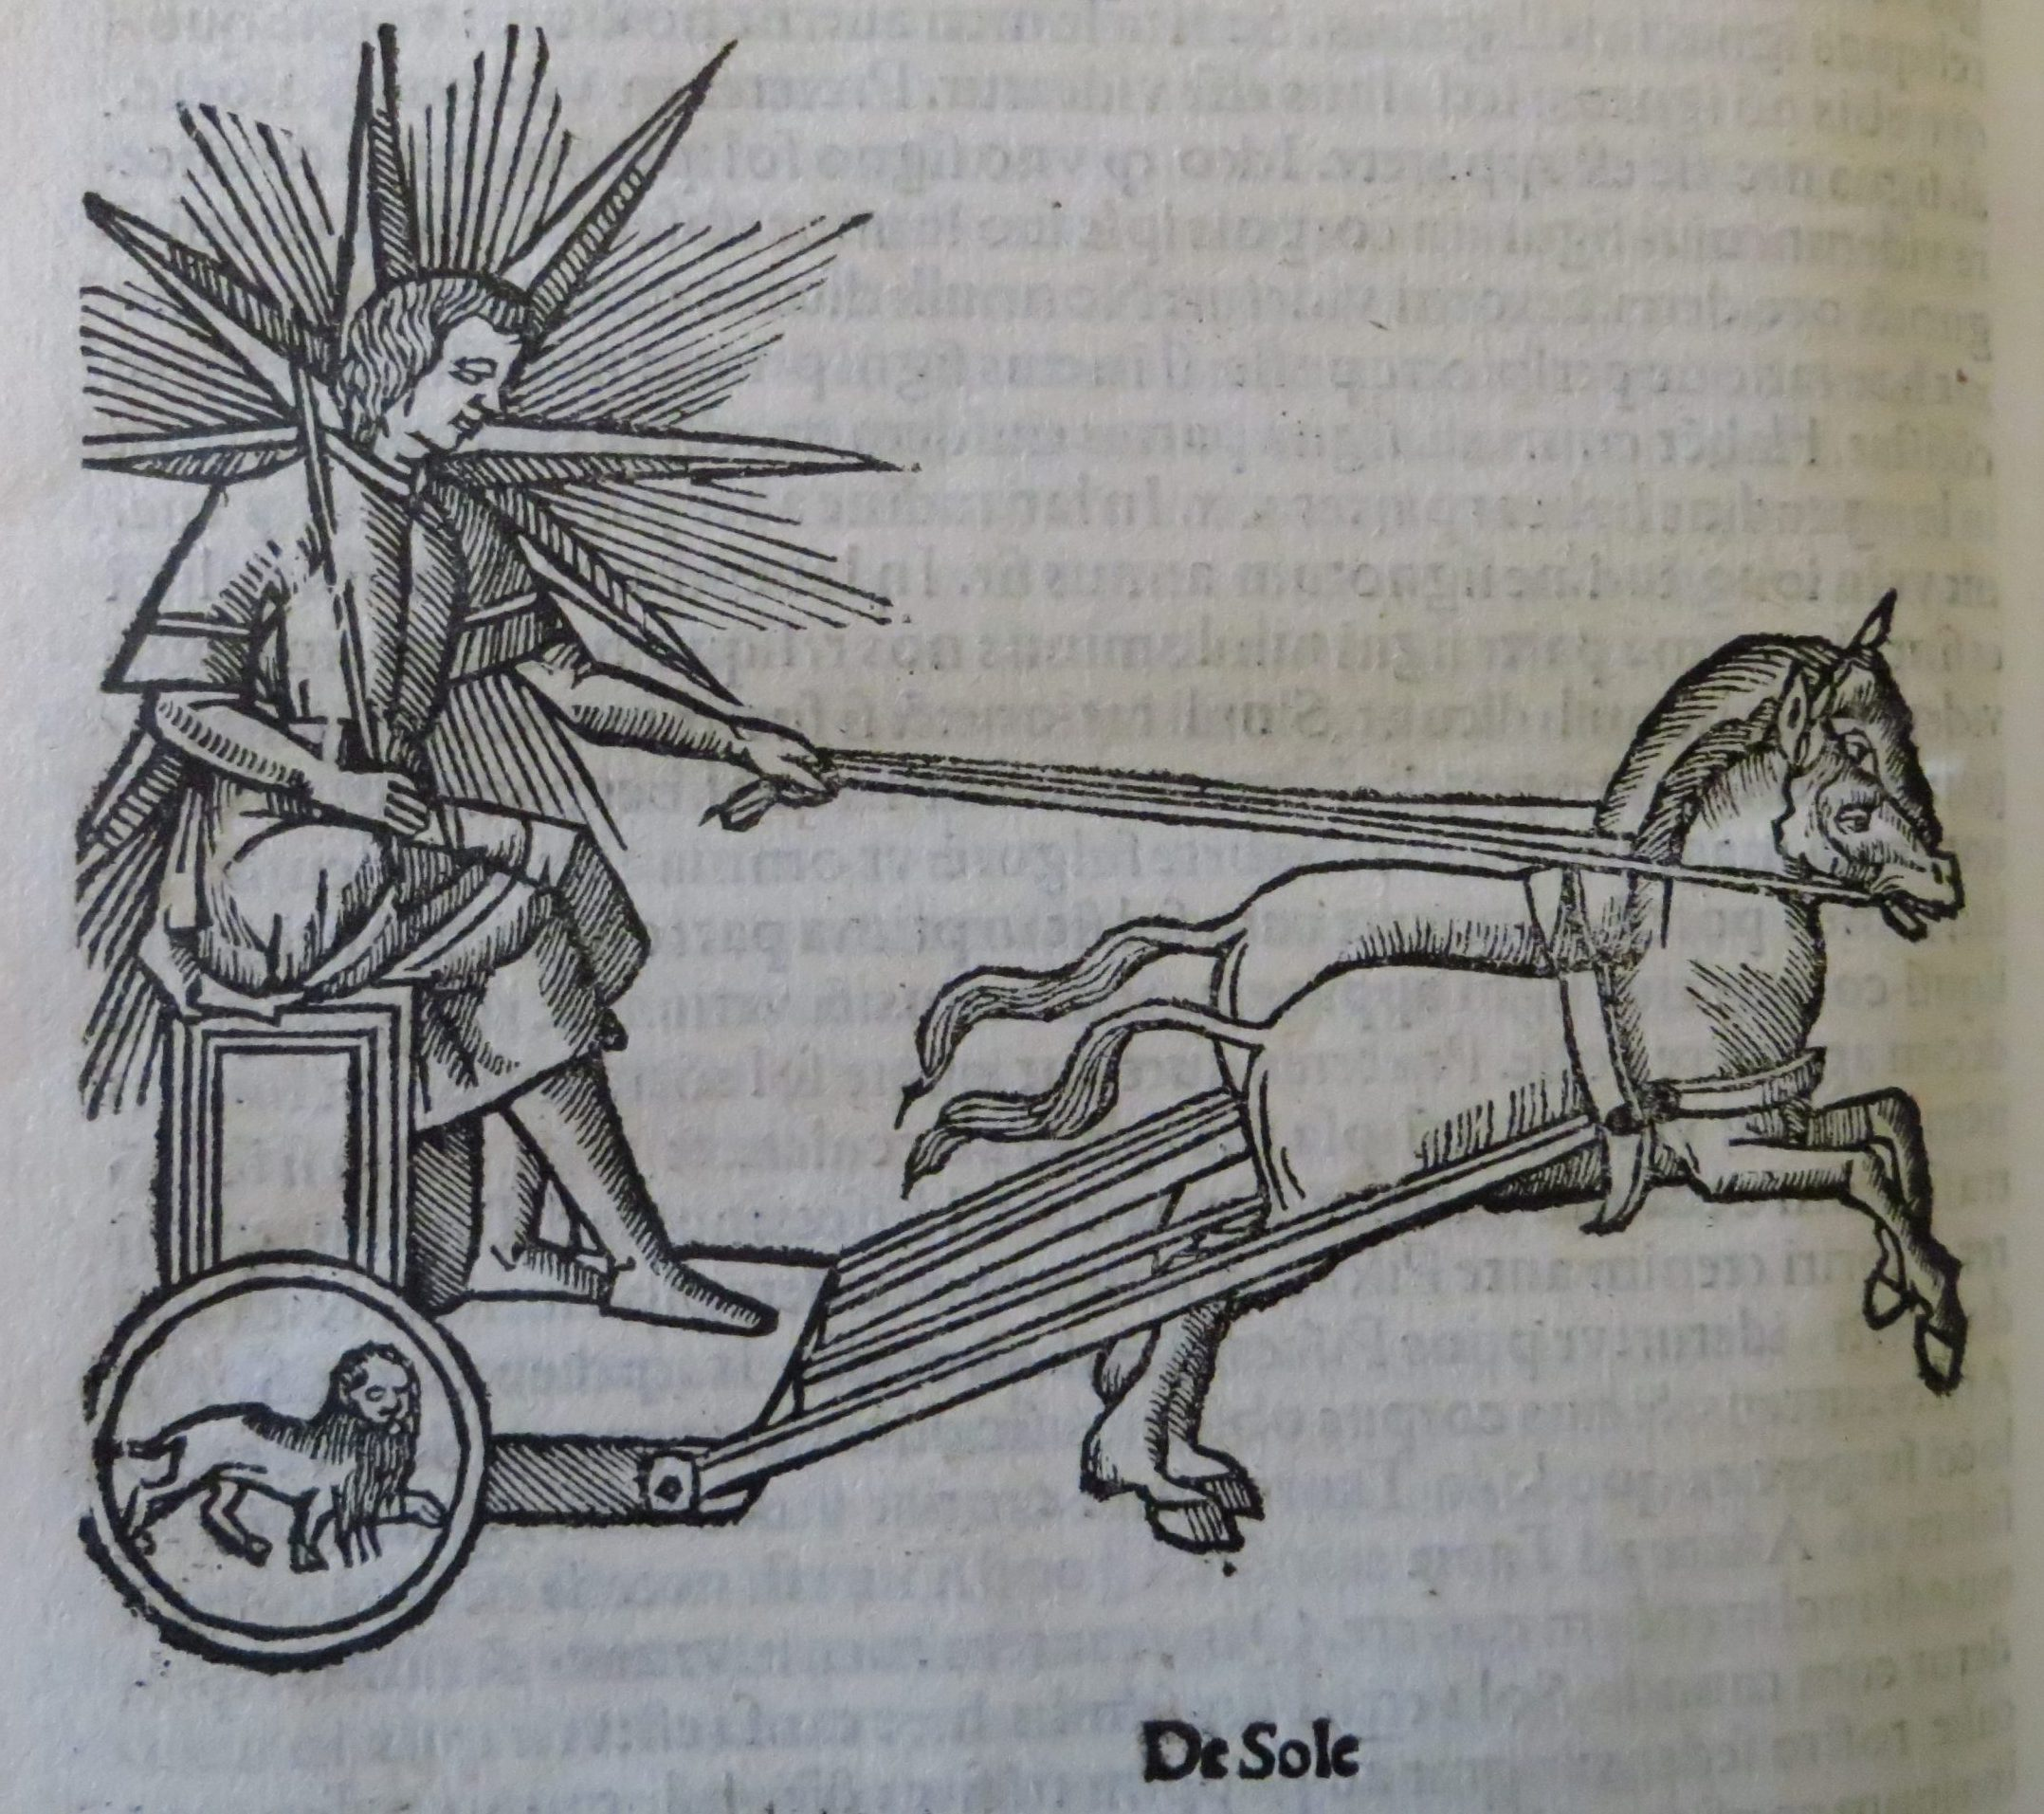 HYGINUS, De Mundo et Sphera, 1517